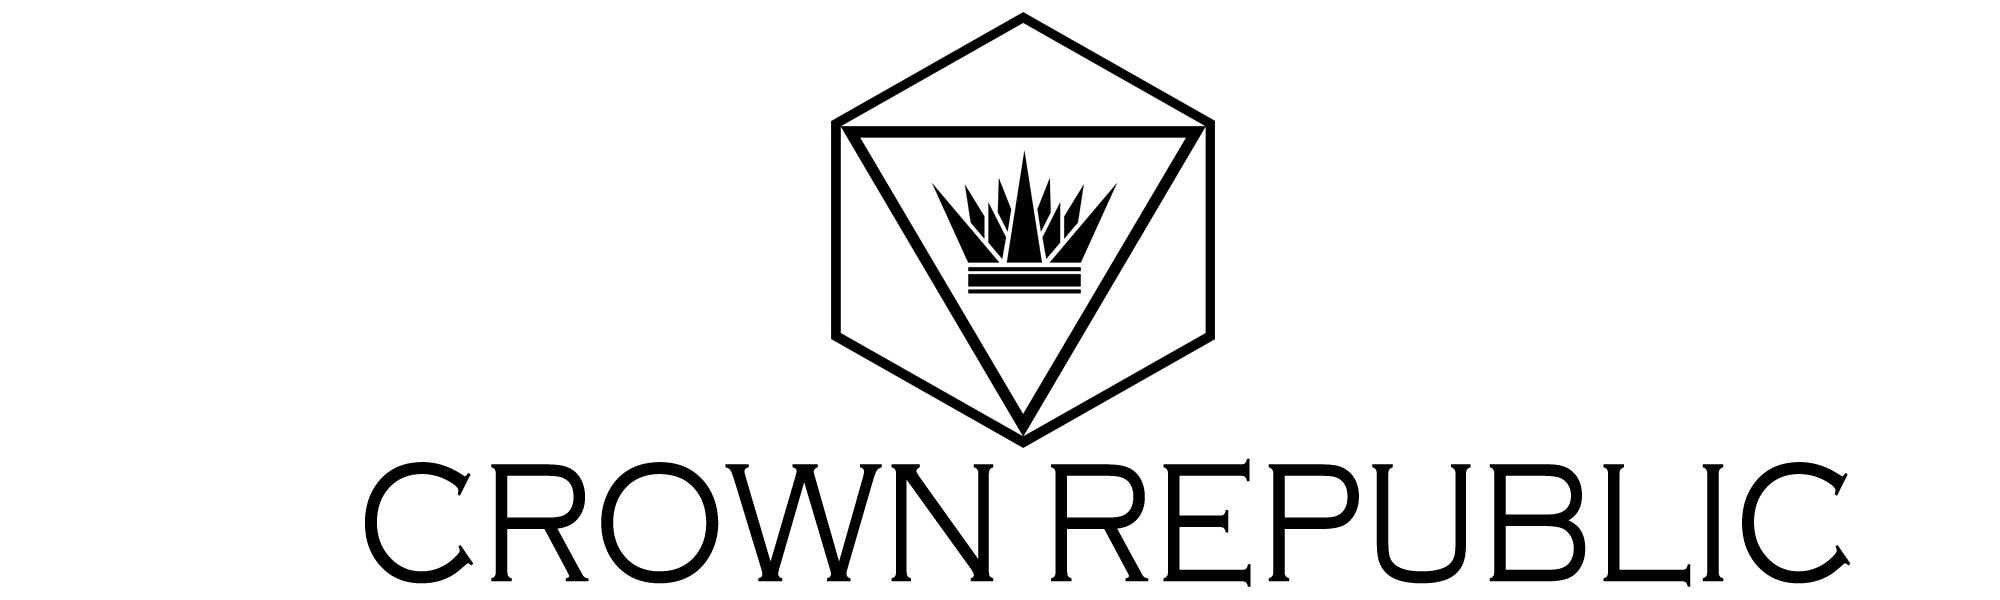 Творческое объединение Crown RE:Public